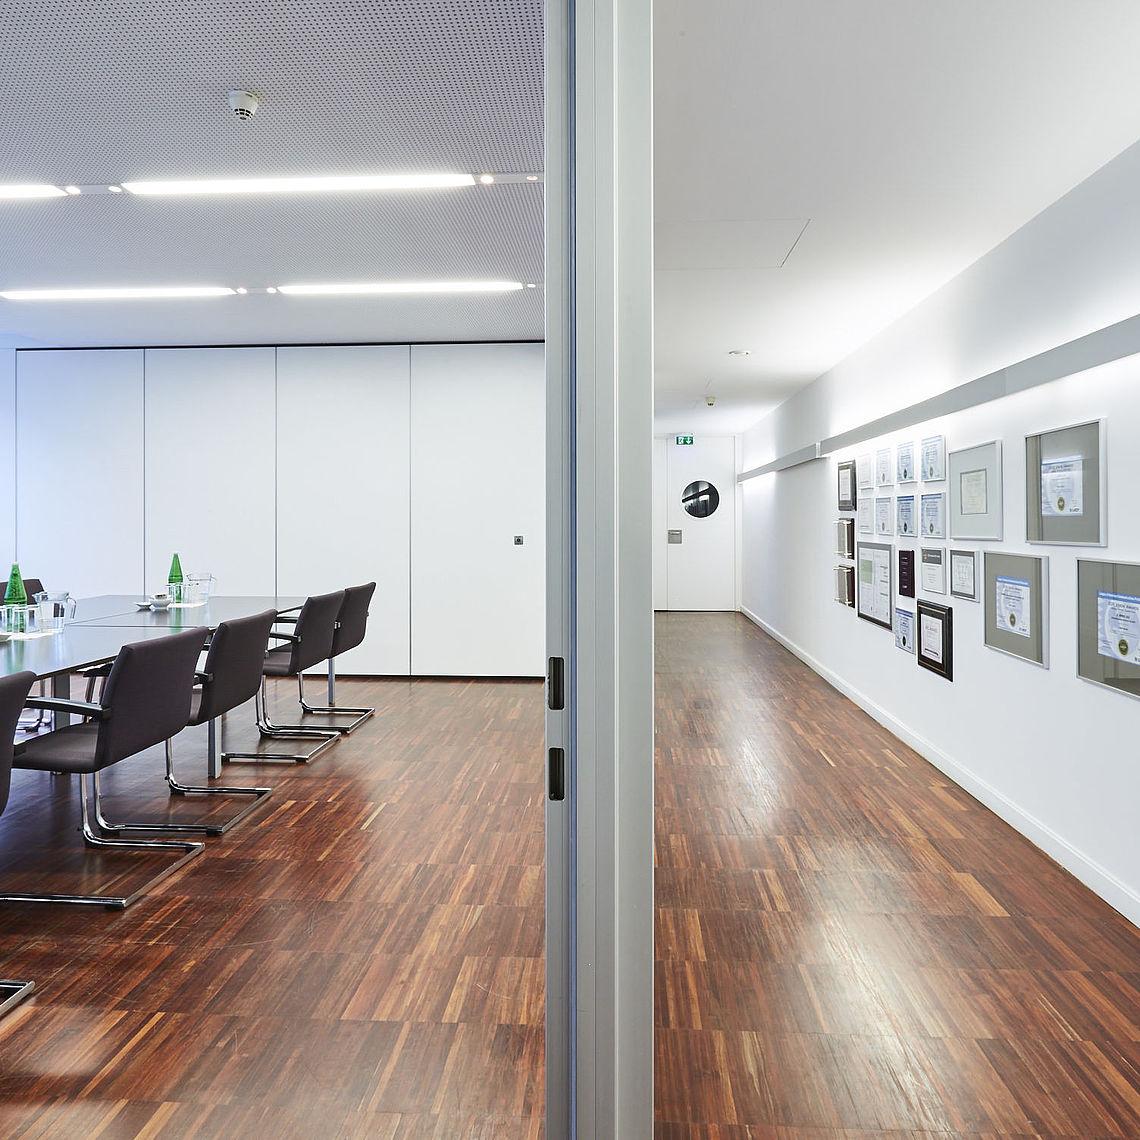 Meeting room and corridor in Akademiehof in Vienna